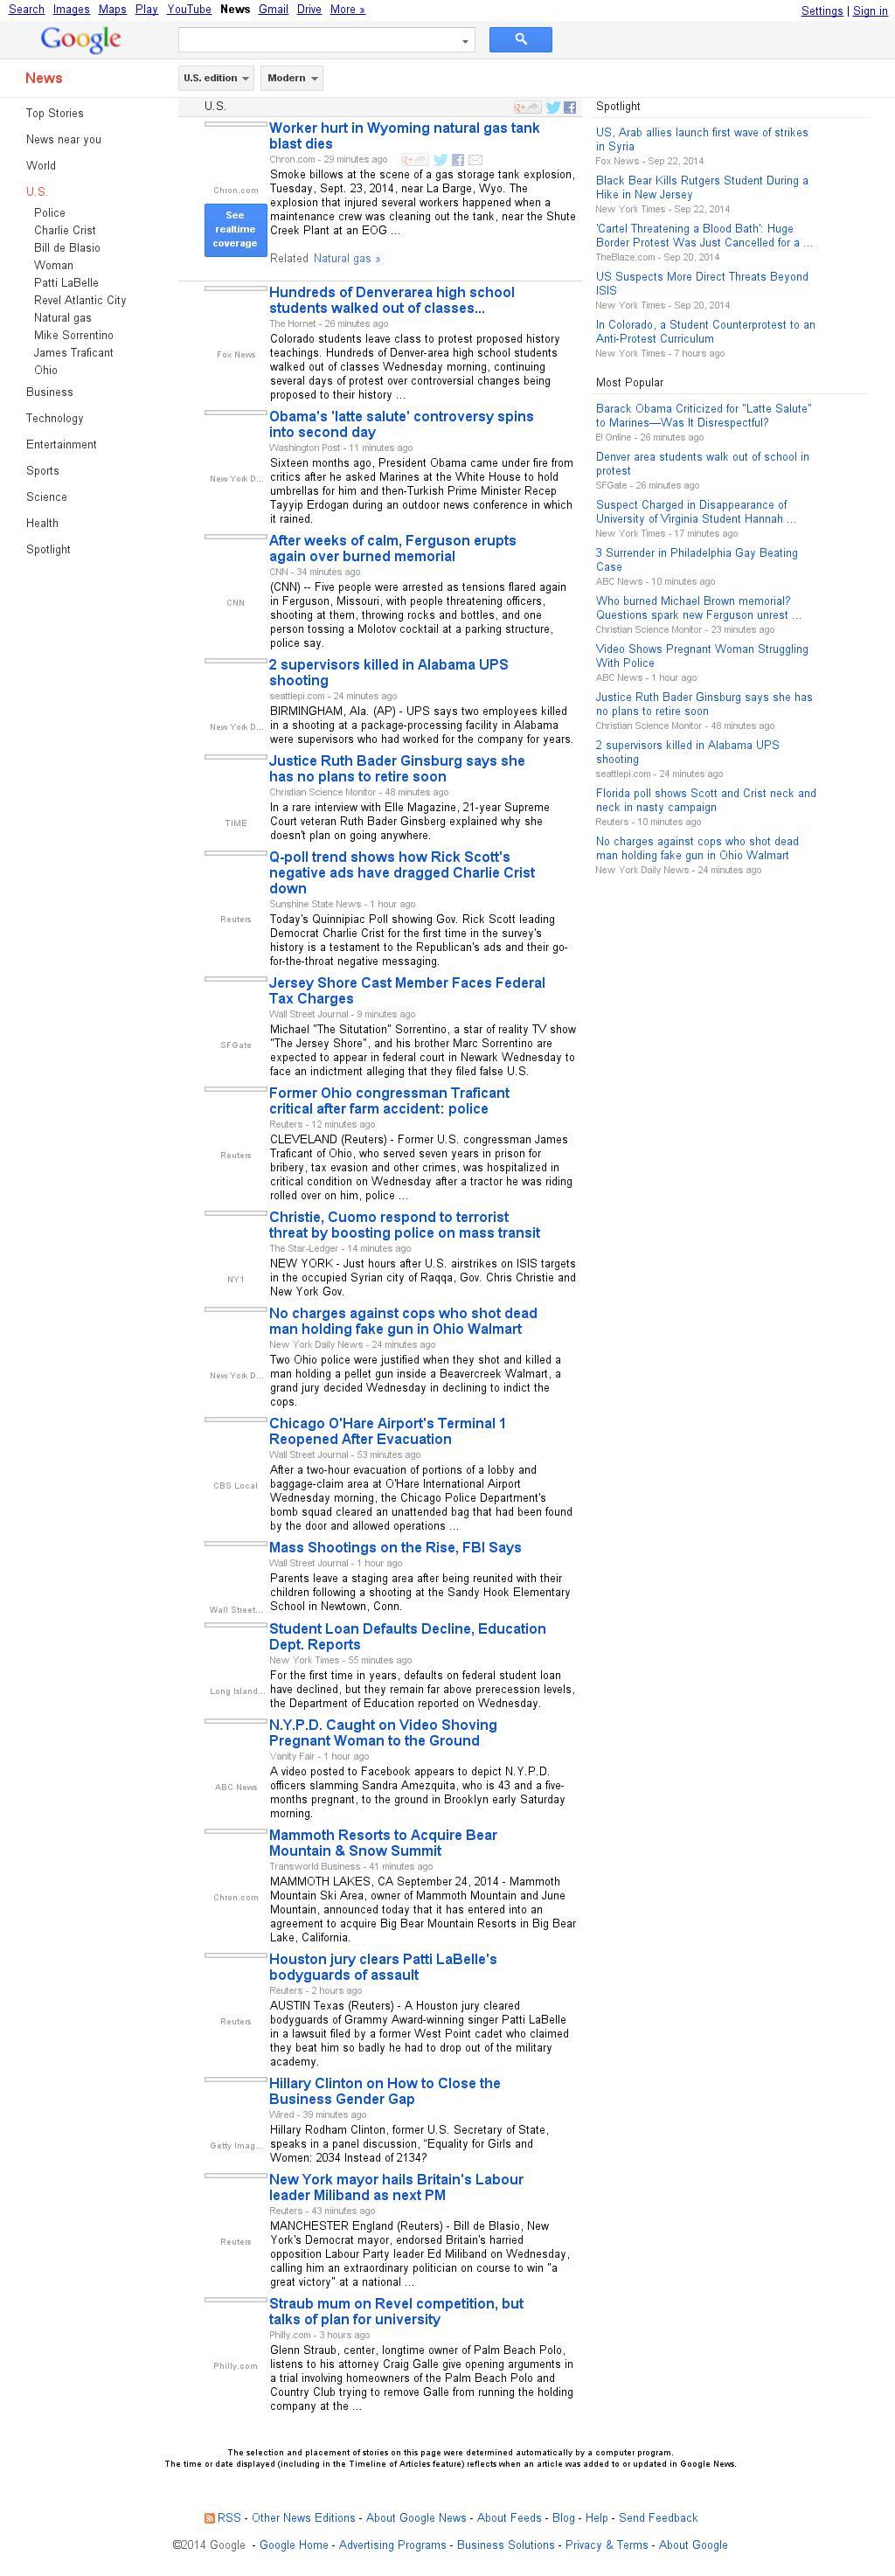 Google News: U.S. at Wednesday Sept. 24, 2014, 6:06 p.m. UTC